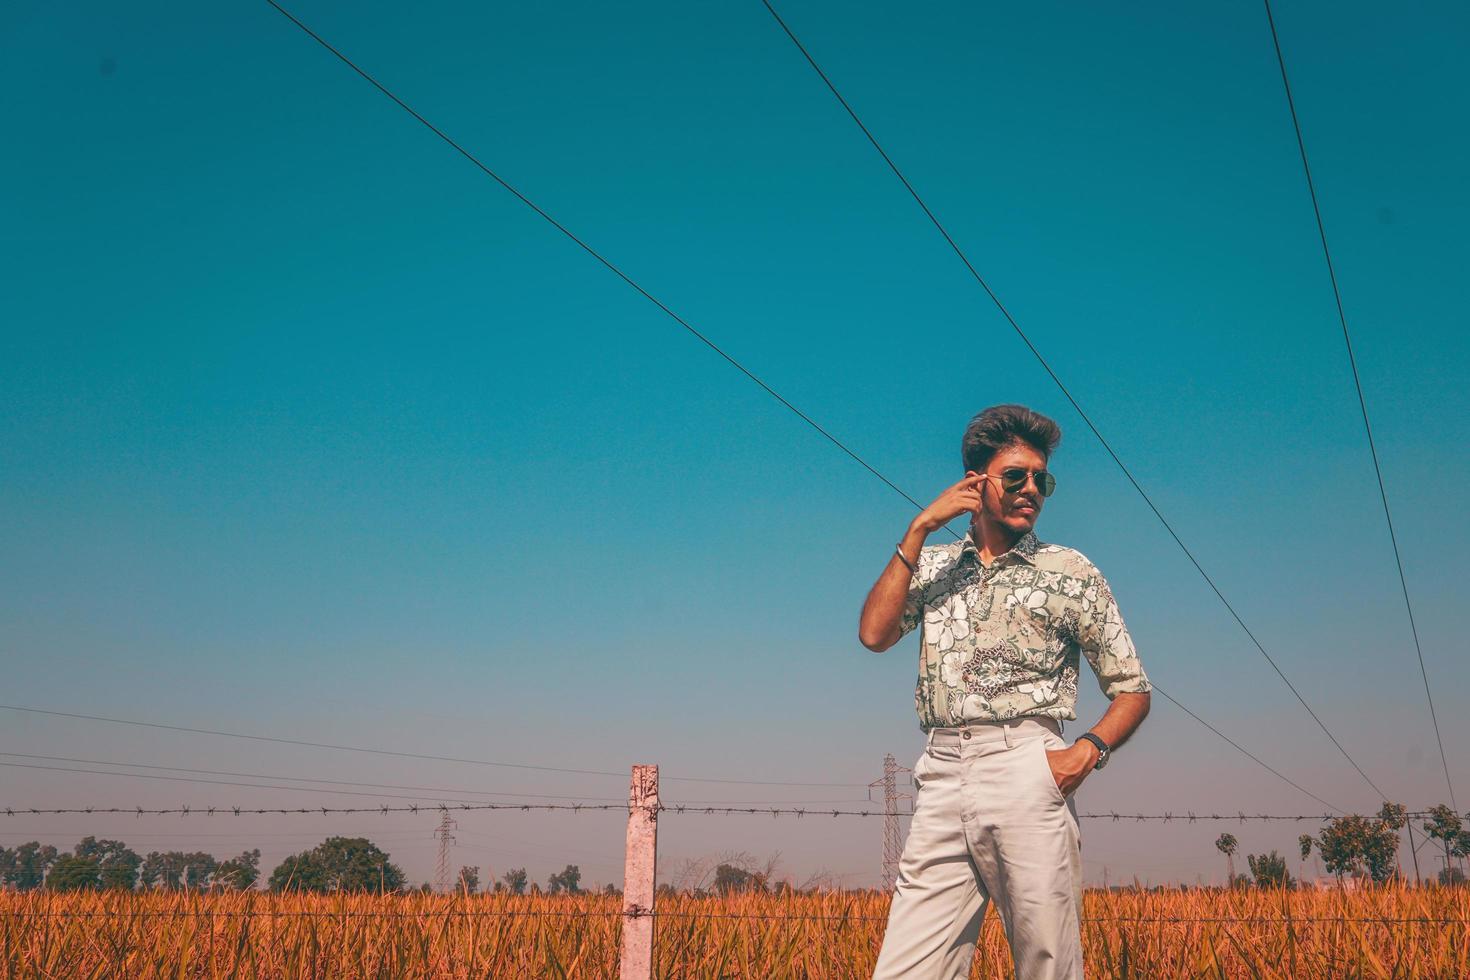 man in zonnebril naast hek en veld foto